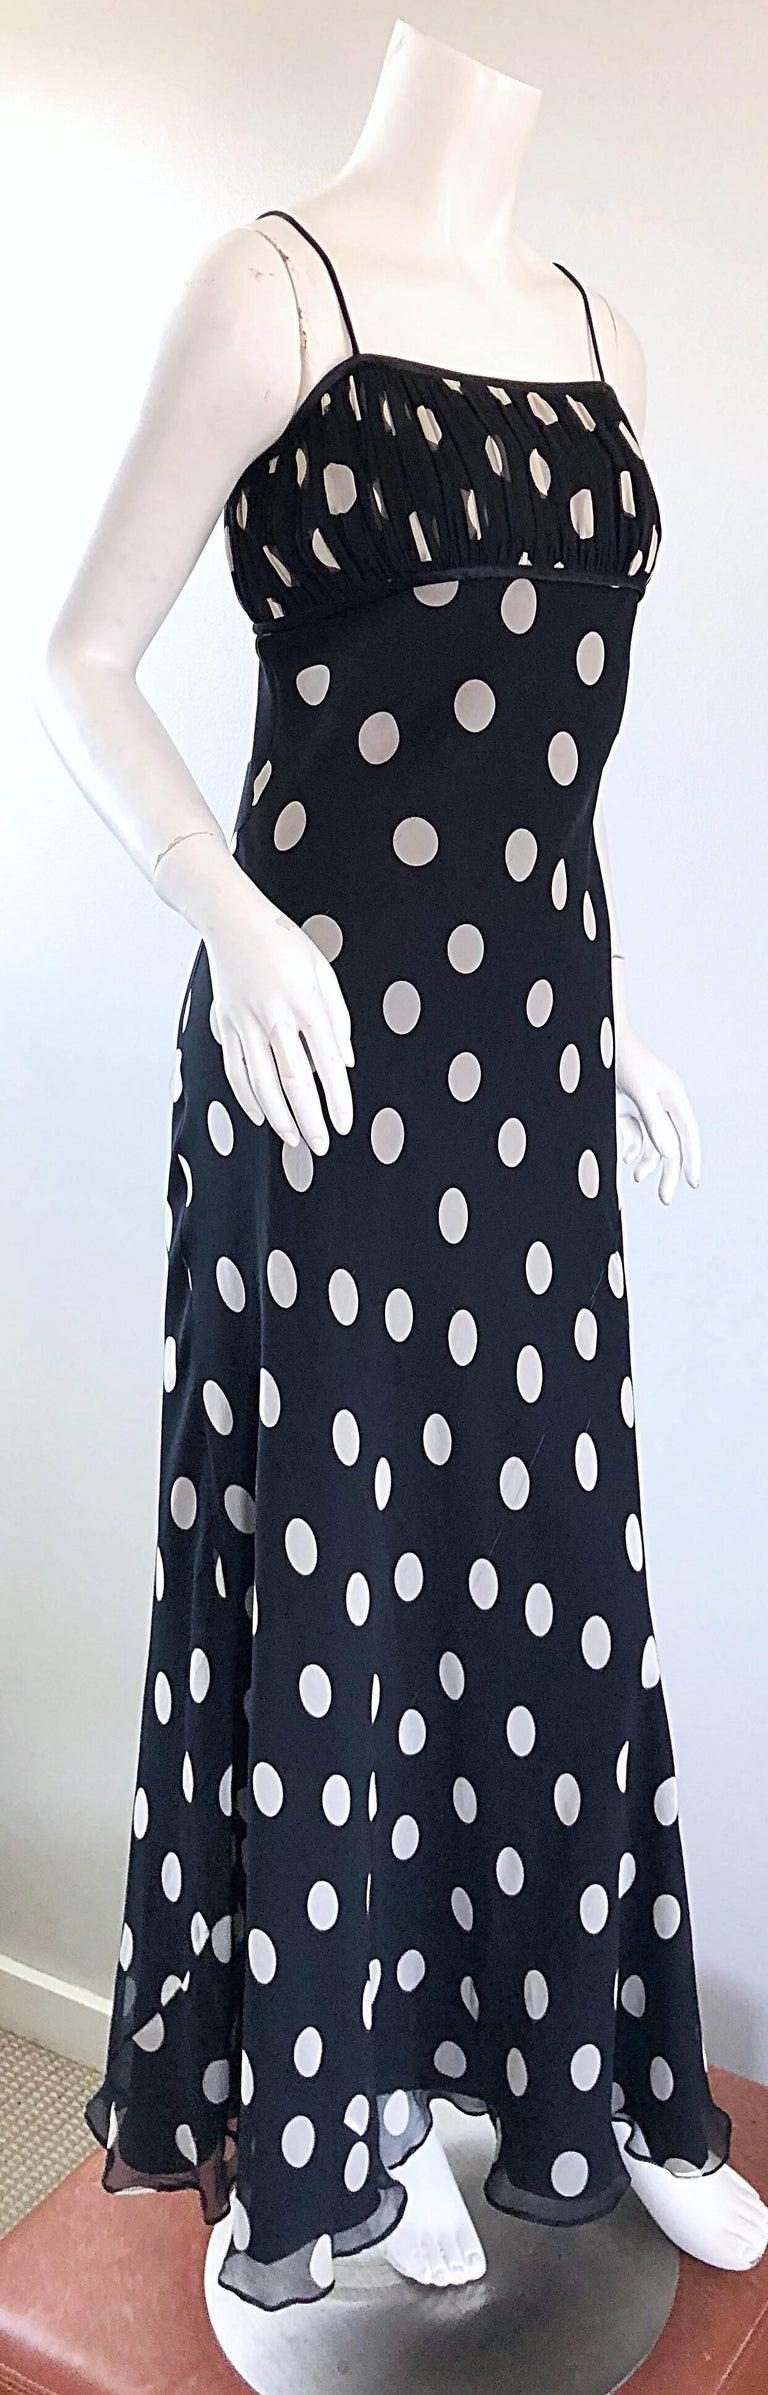 1990s Abriele Melano Black and White Polka Dot Silk Chiffon Maxi Dress 90s Gown For Sale 6